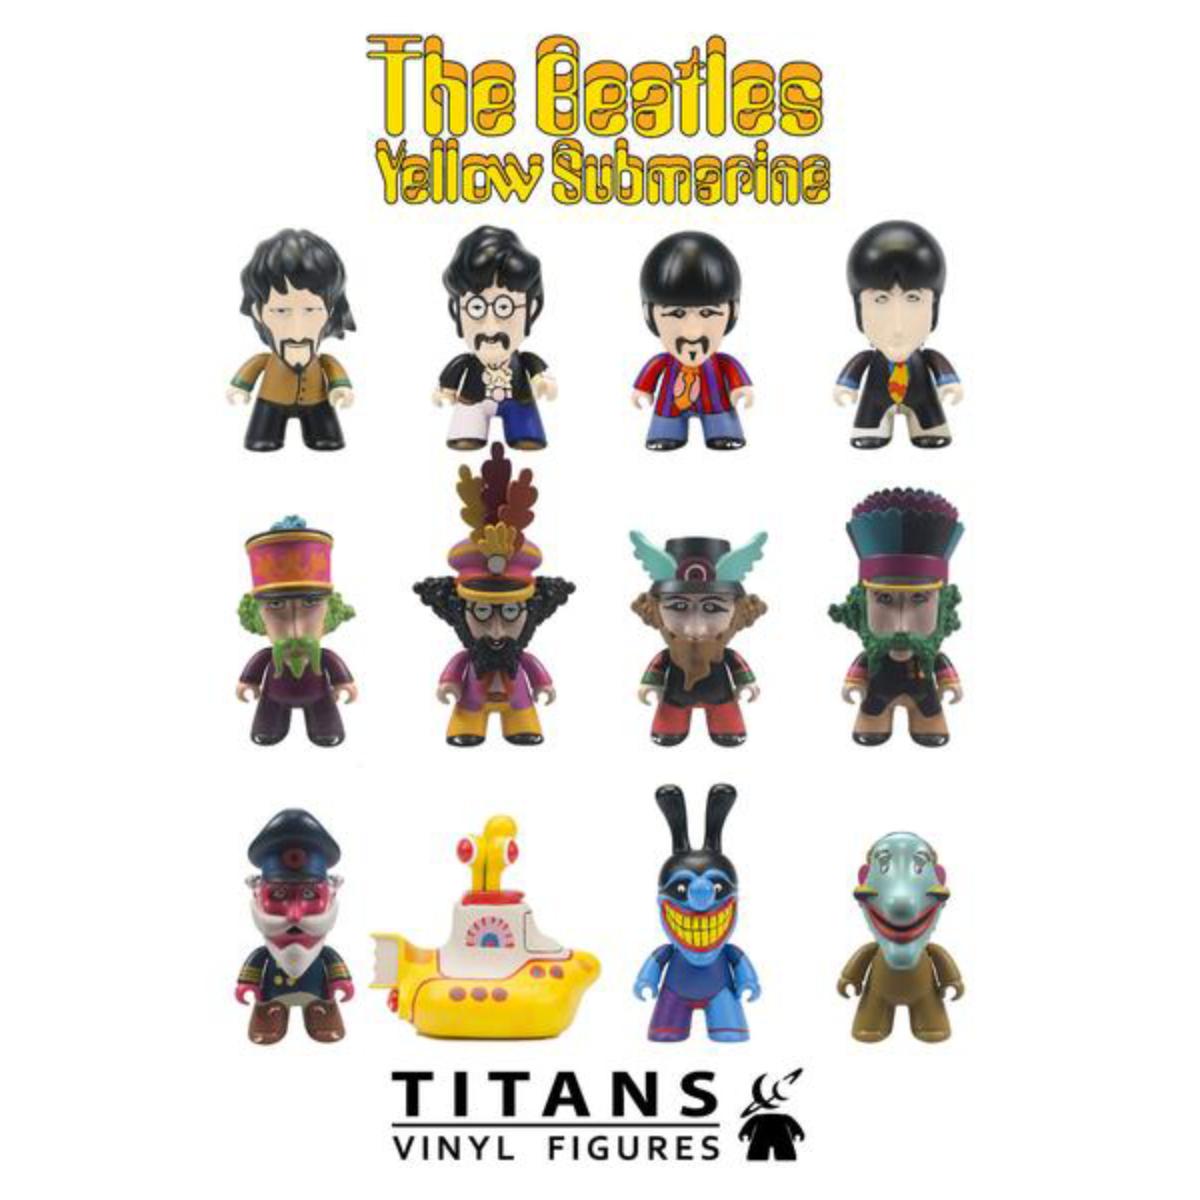 The Beatles TITANS: Yellow Submarine Single Unit